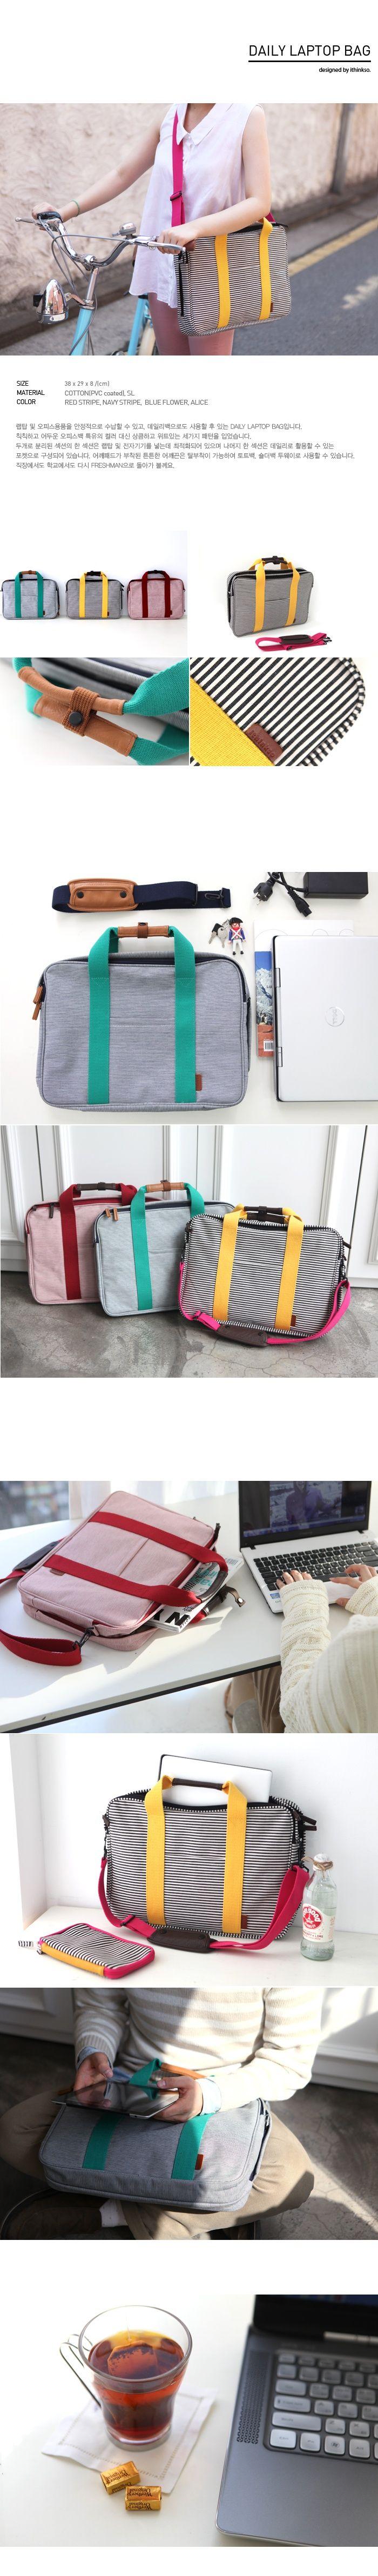 Laptop bags office depot - Laptop Bag Laptops Wanderlust Bags